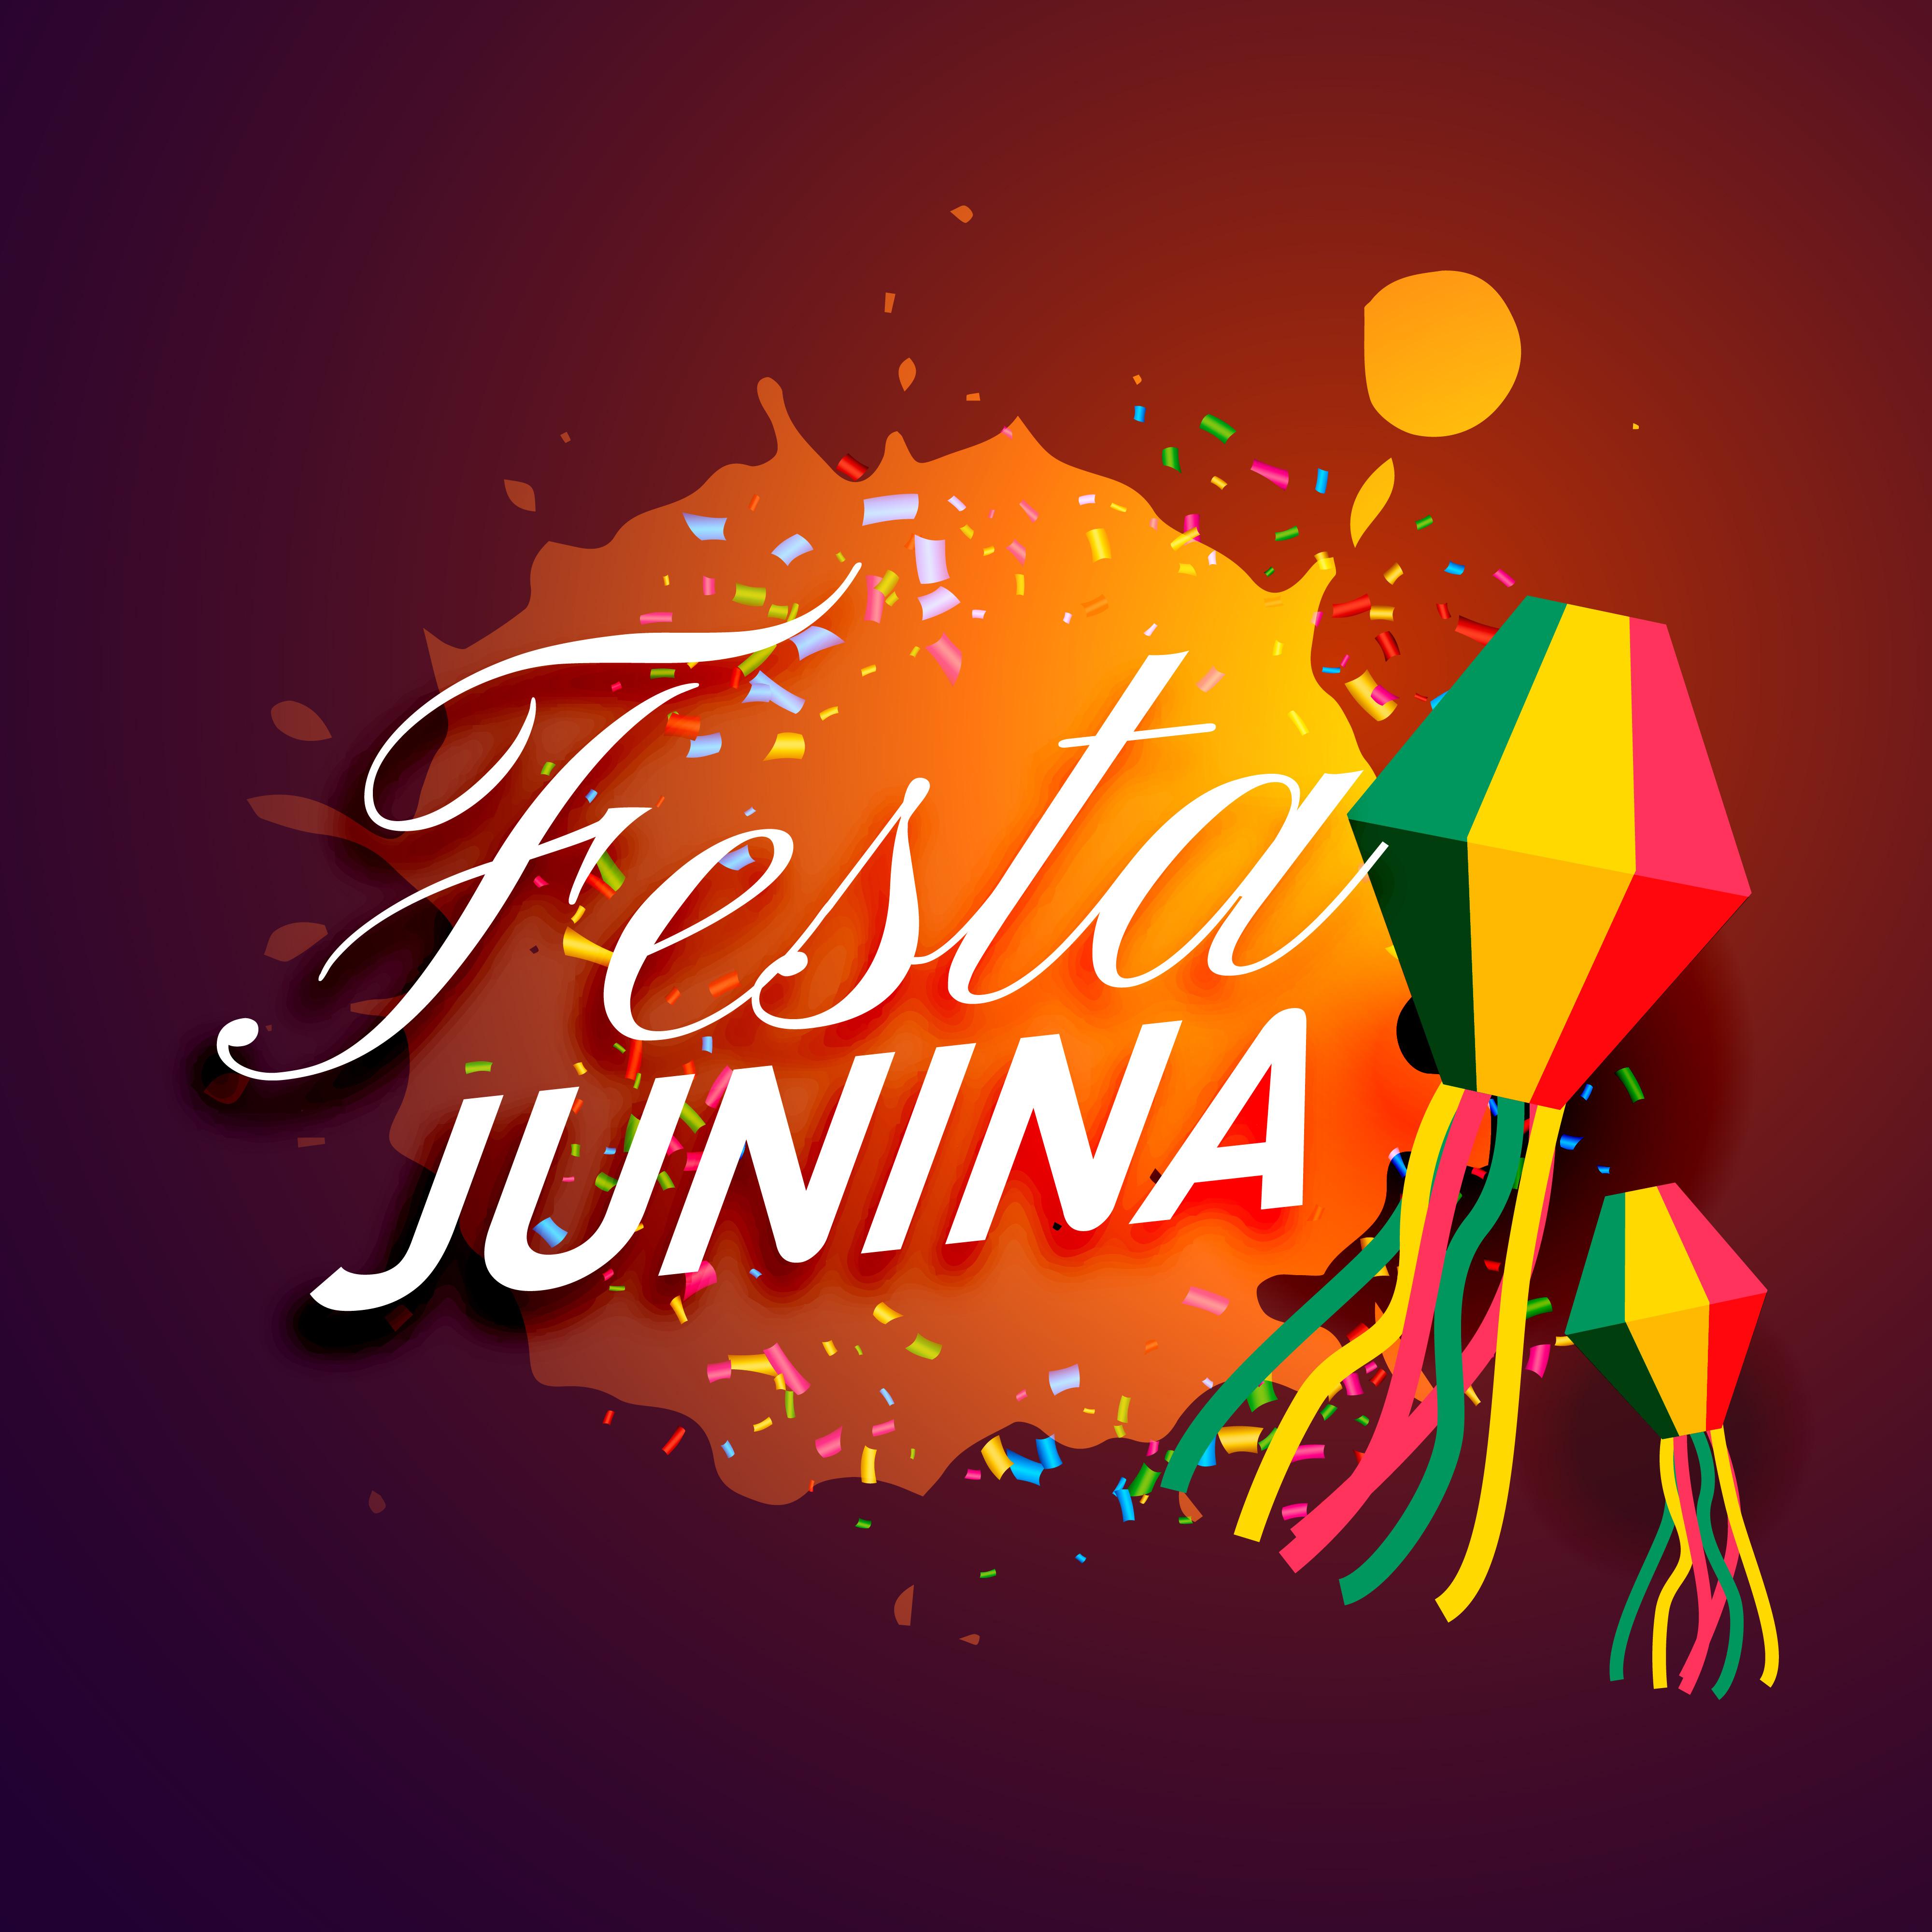 party of festa junina festival invitation card design - Download ...